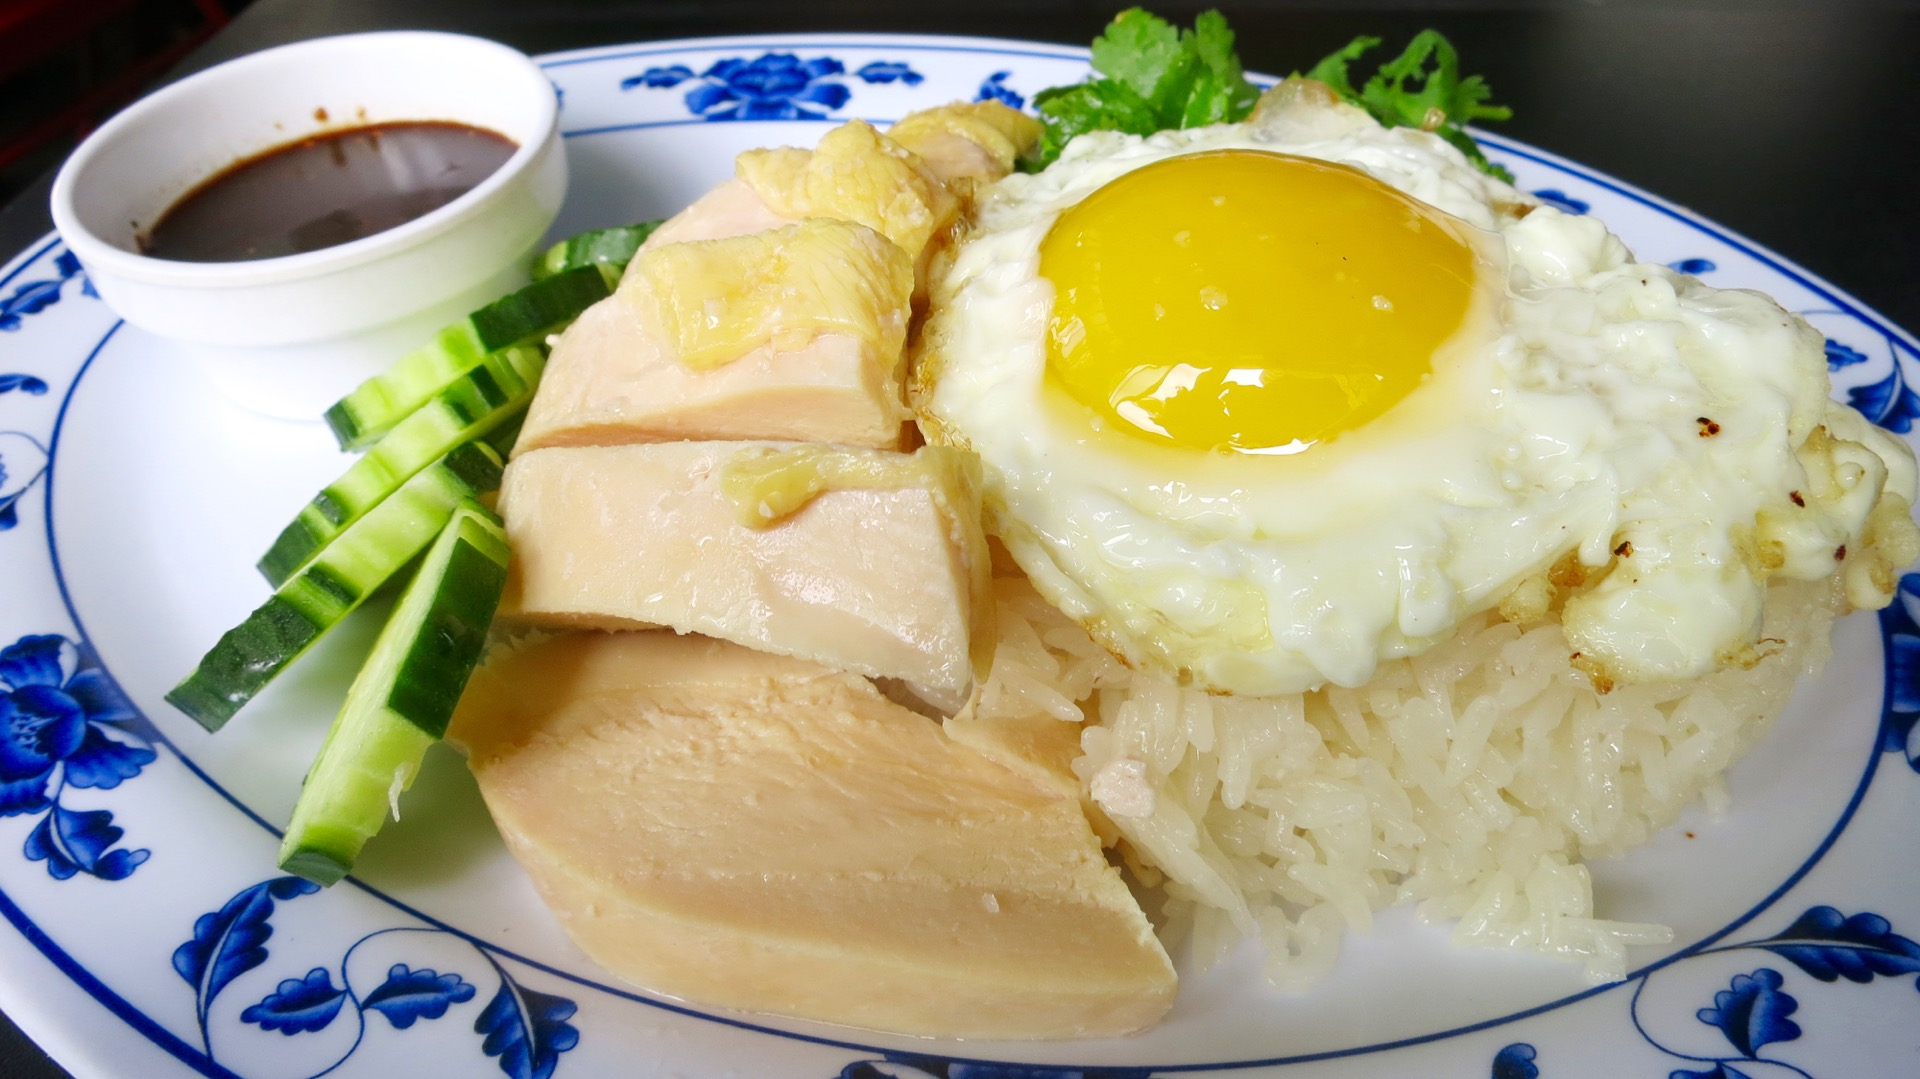 Khao mun gai is a classic Thai comfort food dish.